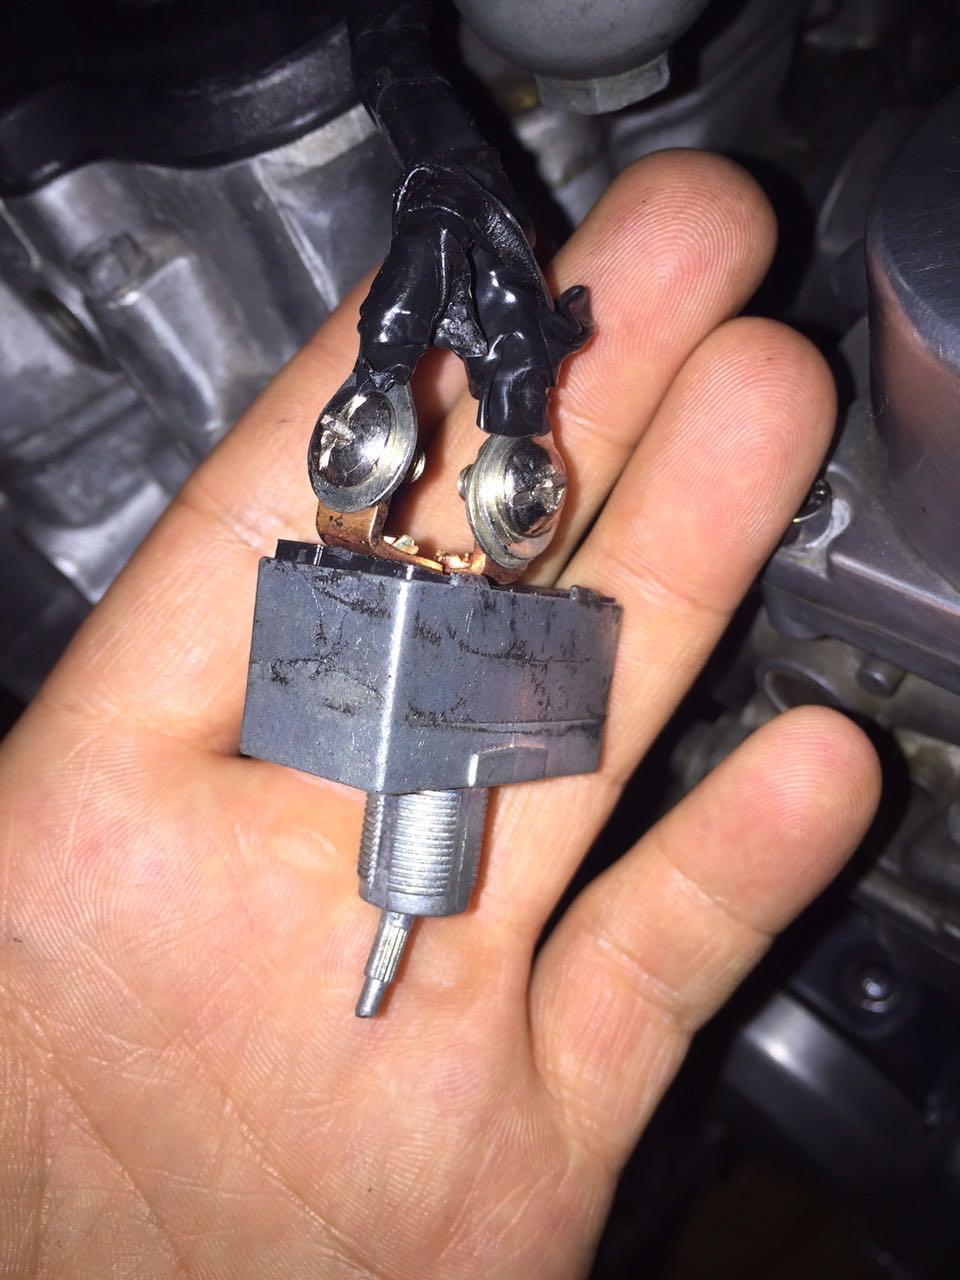 Cb650 Ignition Switch Thread Wire Help